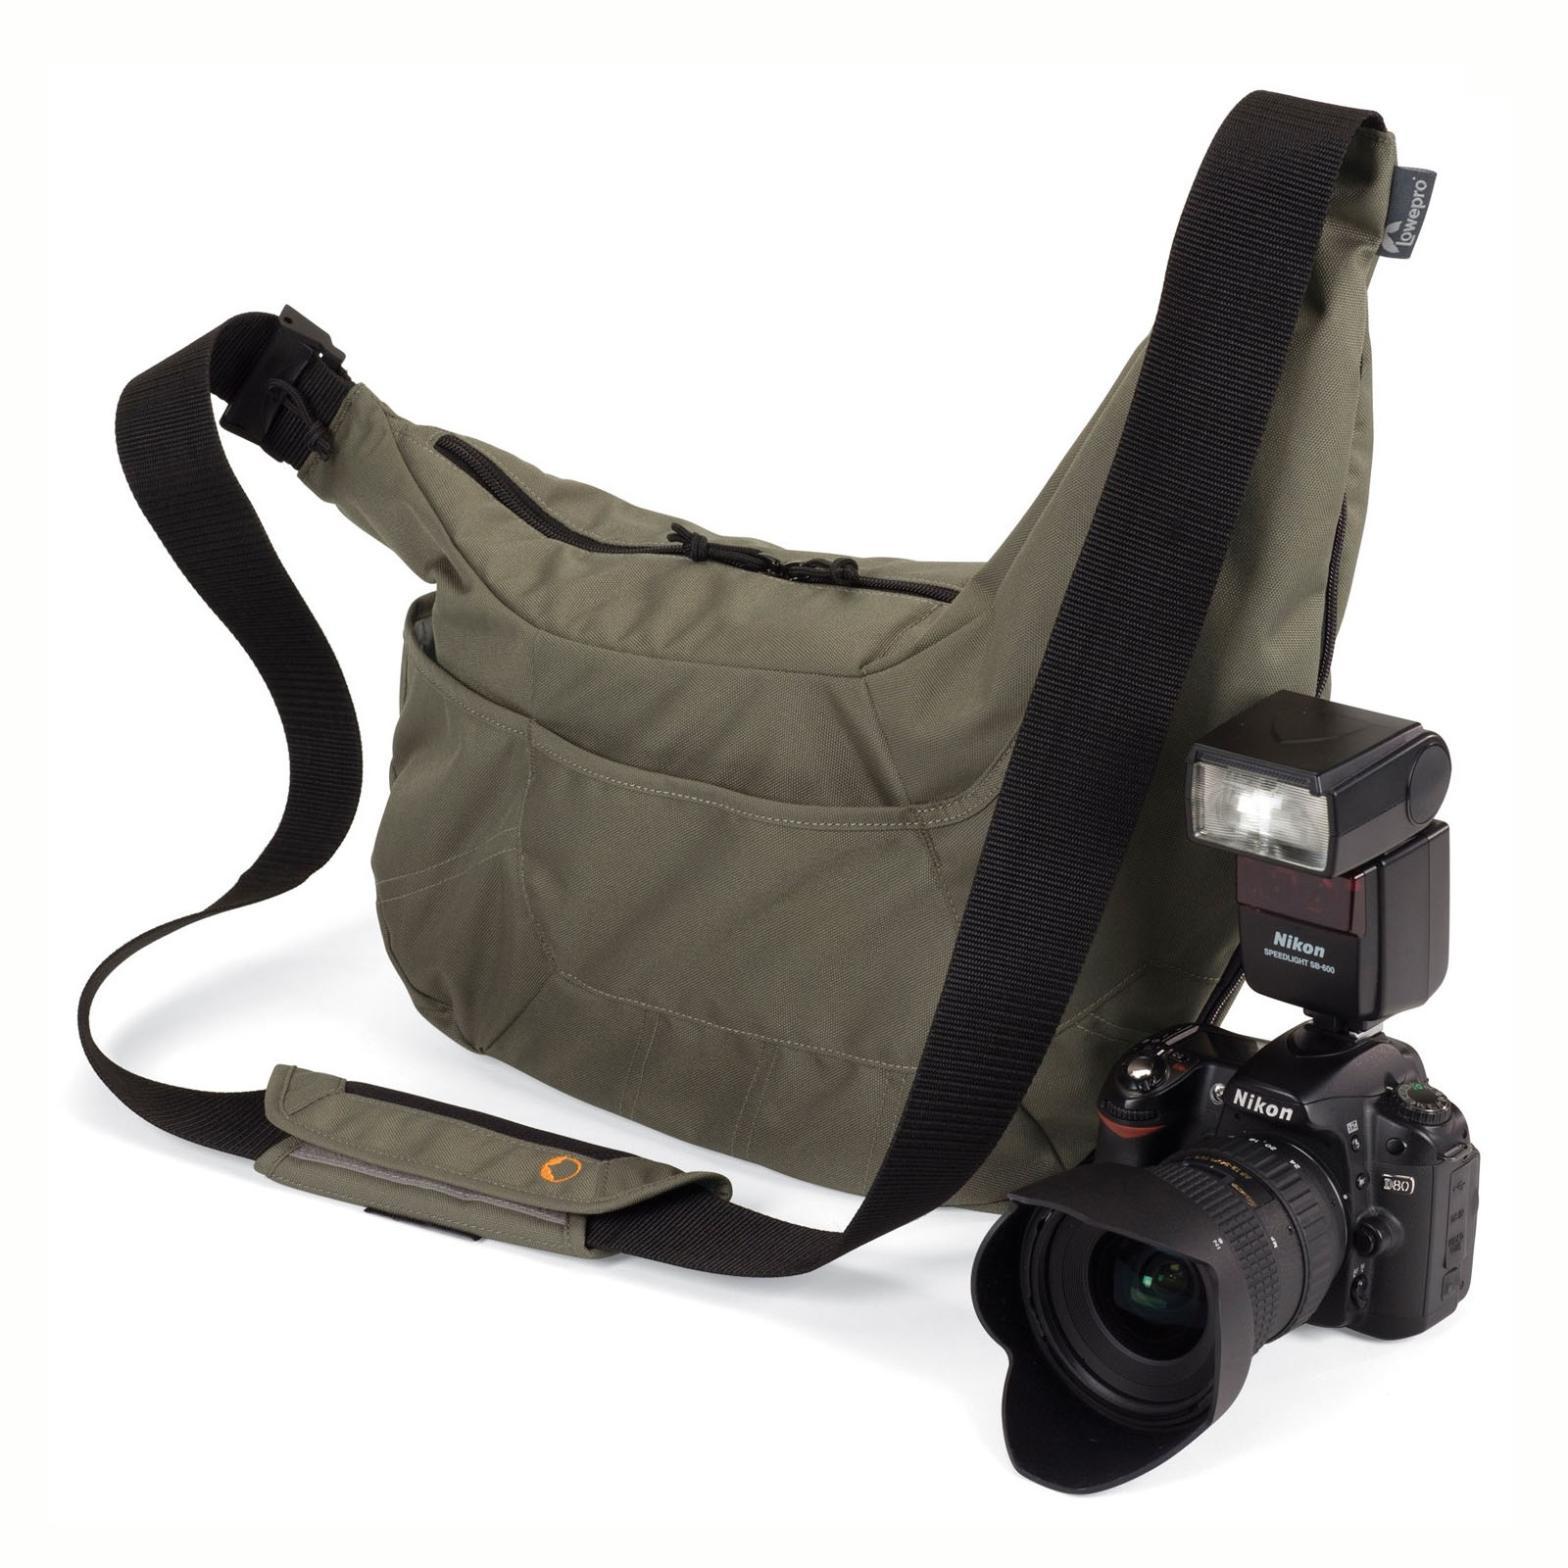 Gray Waterproof Genuine Lowepro Po the Passport Sling PS DSLR SLR Camera Bag Travel Shoulder Camera Bag for Canon Nikon Sony(China (Mainland))